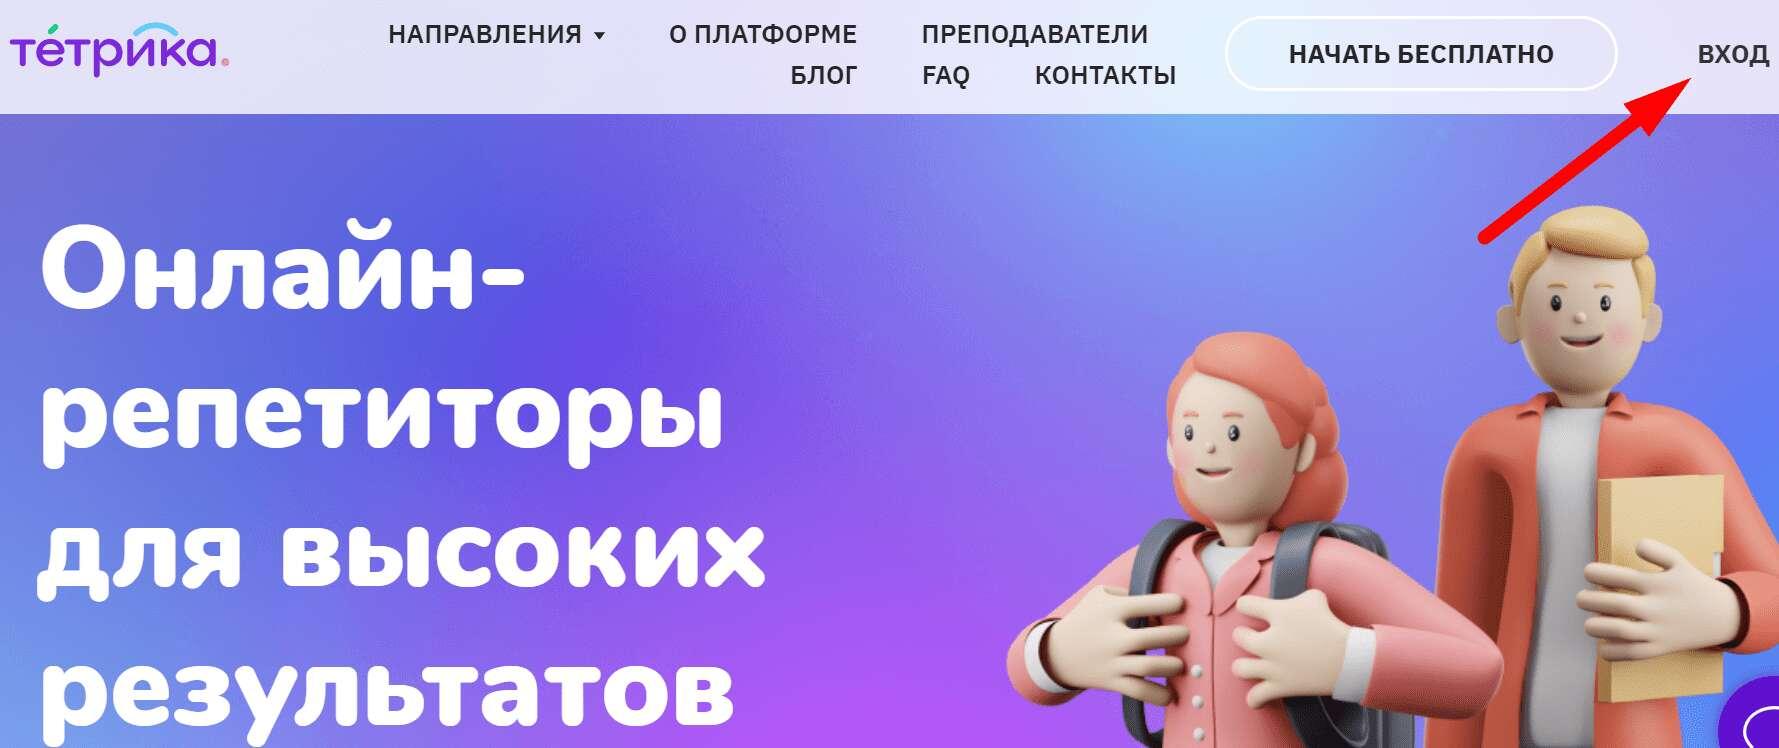 Официальный сайт онлайн-платформы «Тетрика»